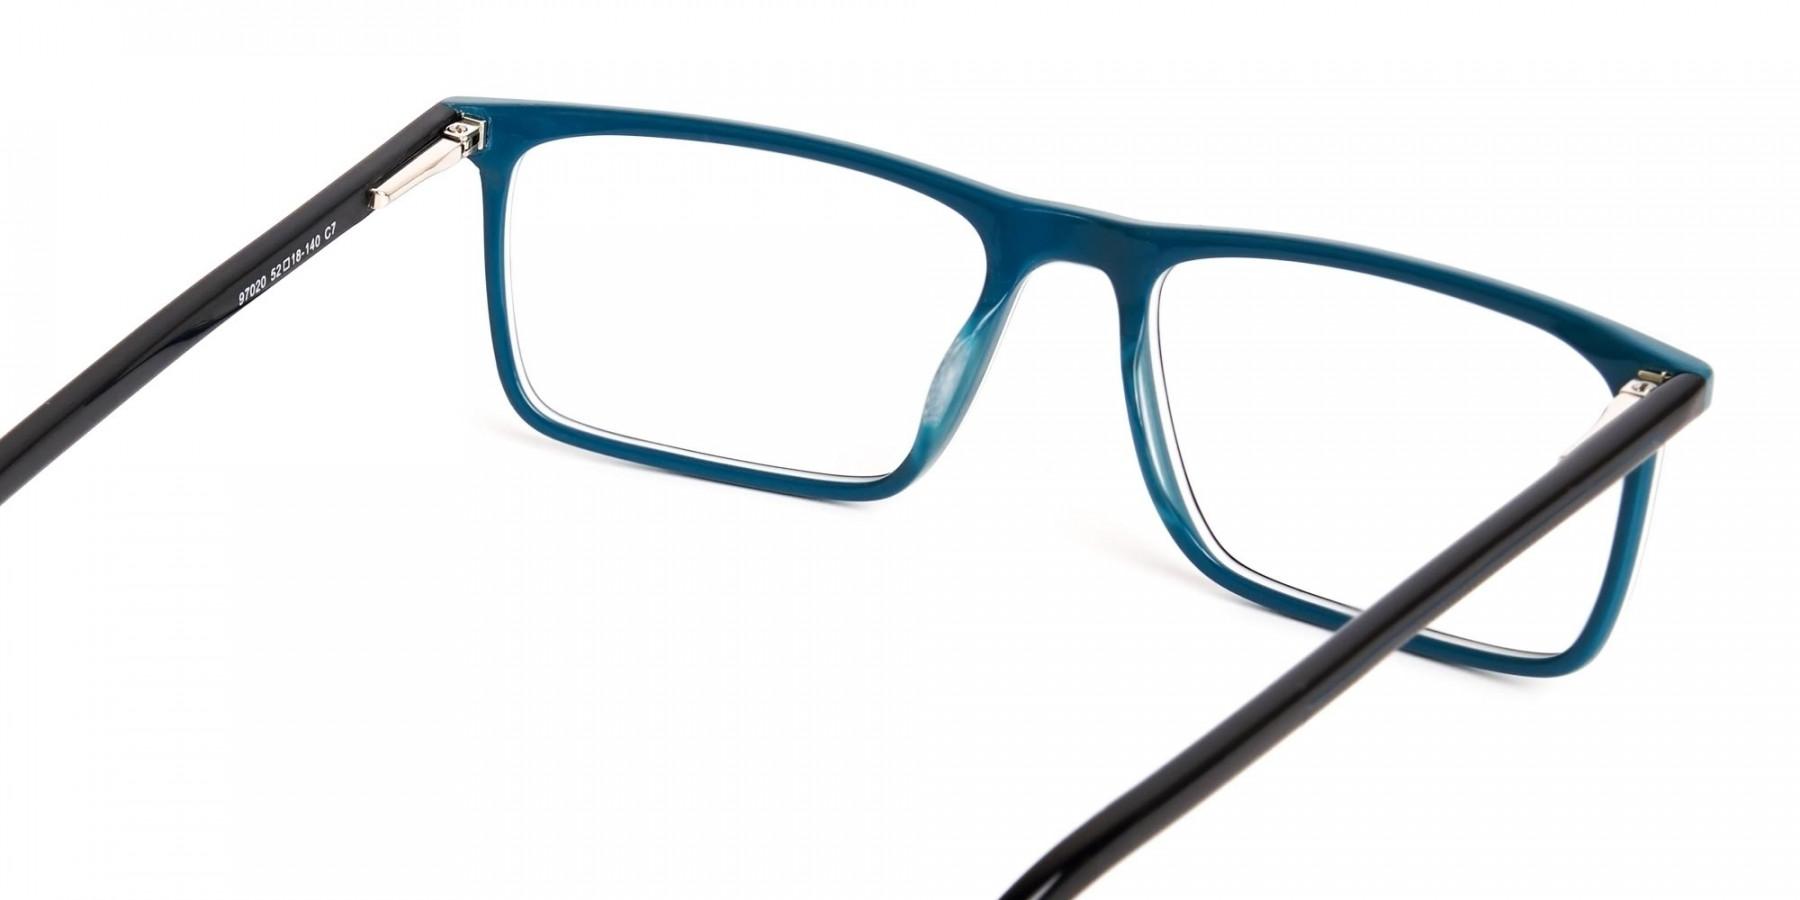 black-and-teal-rectangular-glasses-frames-1